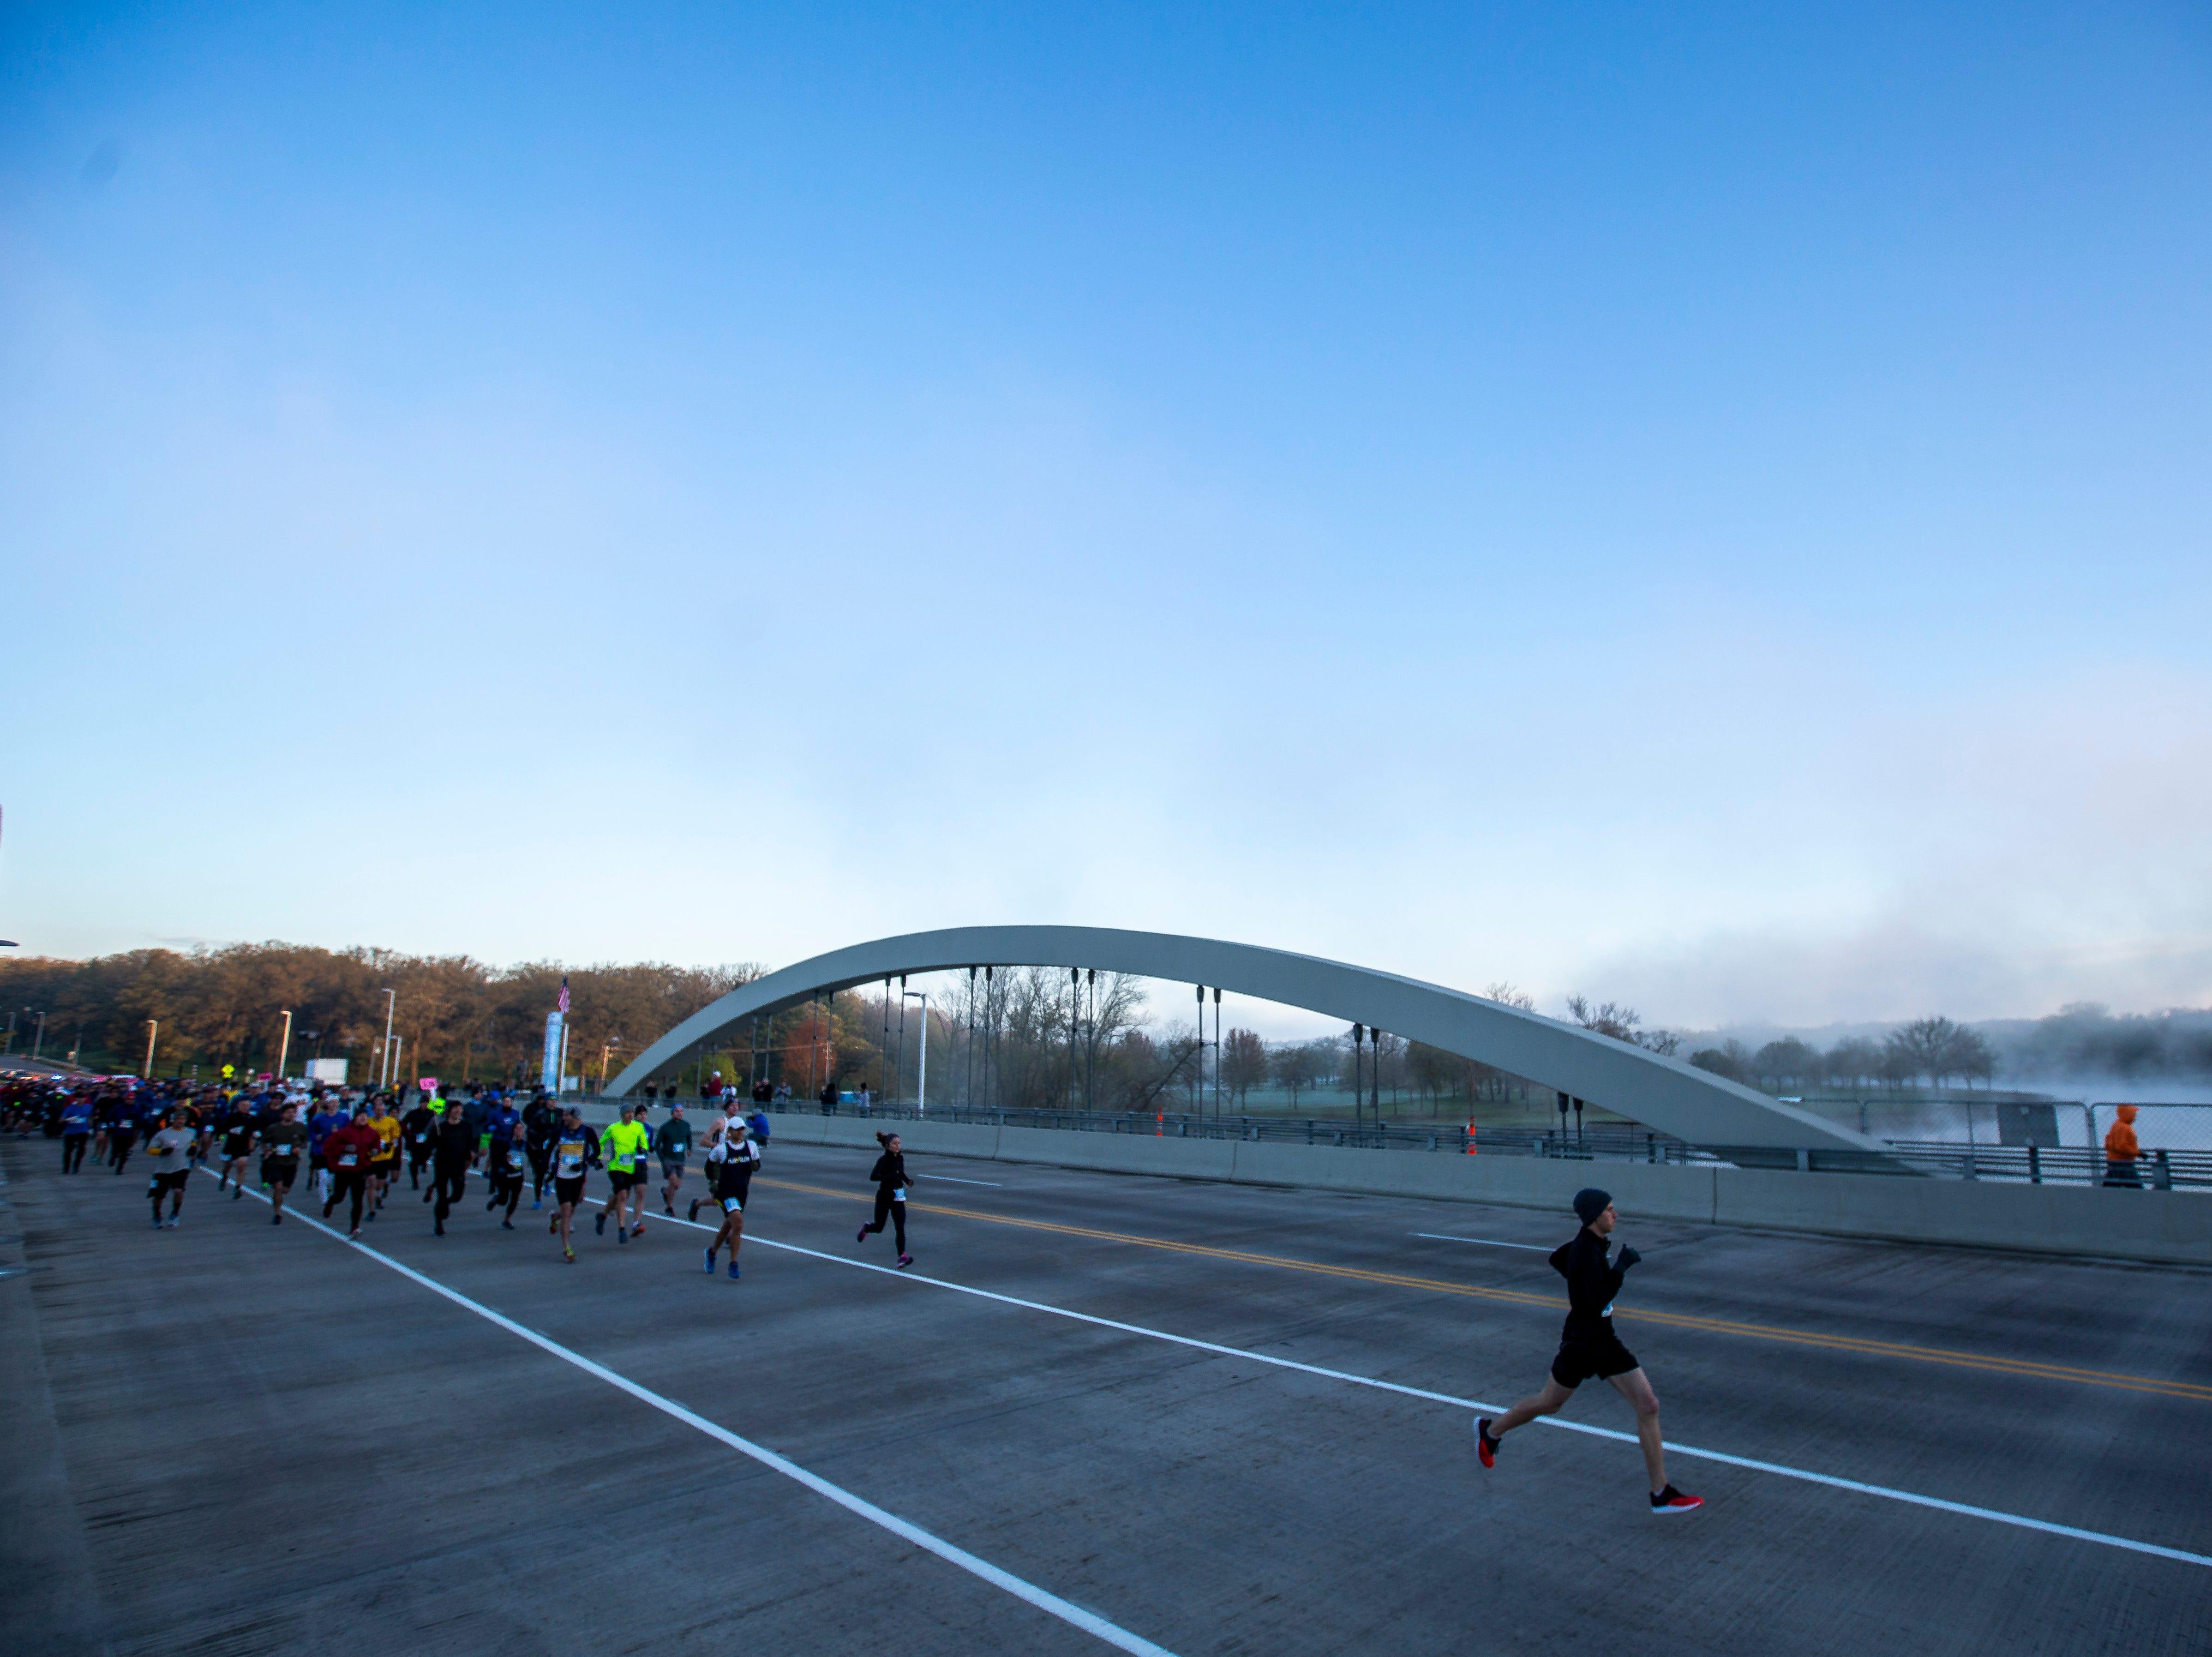 Runners break away at the start during the second annual Run CRANDIC marathon, Sunday, April 28, 2019, across the Park Street Road Bridge over the Iowa River in Iowa City, Iowa.